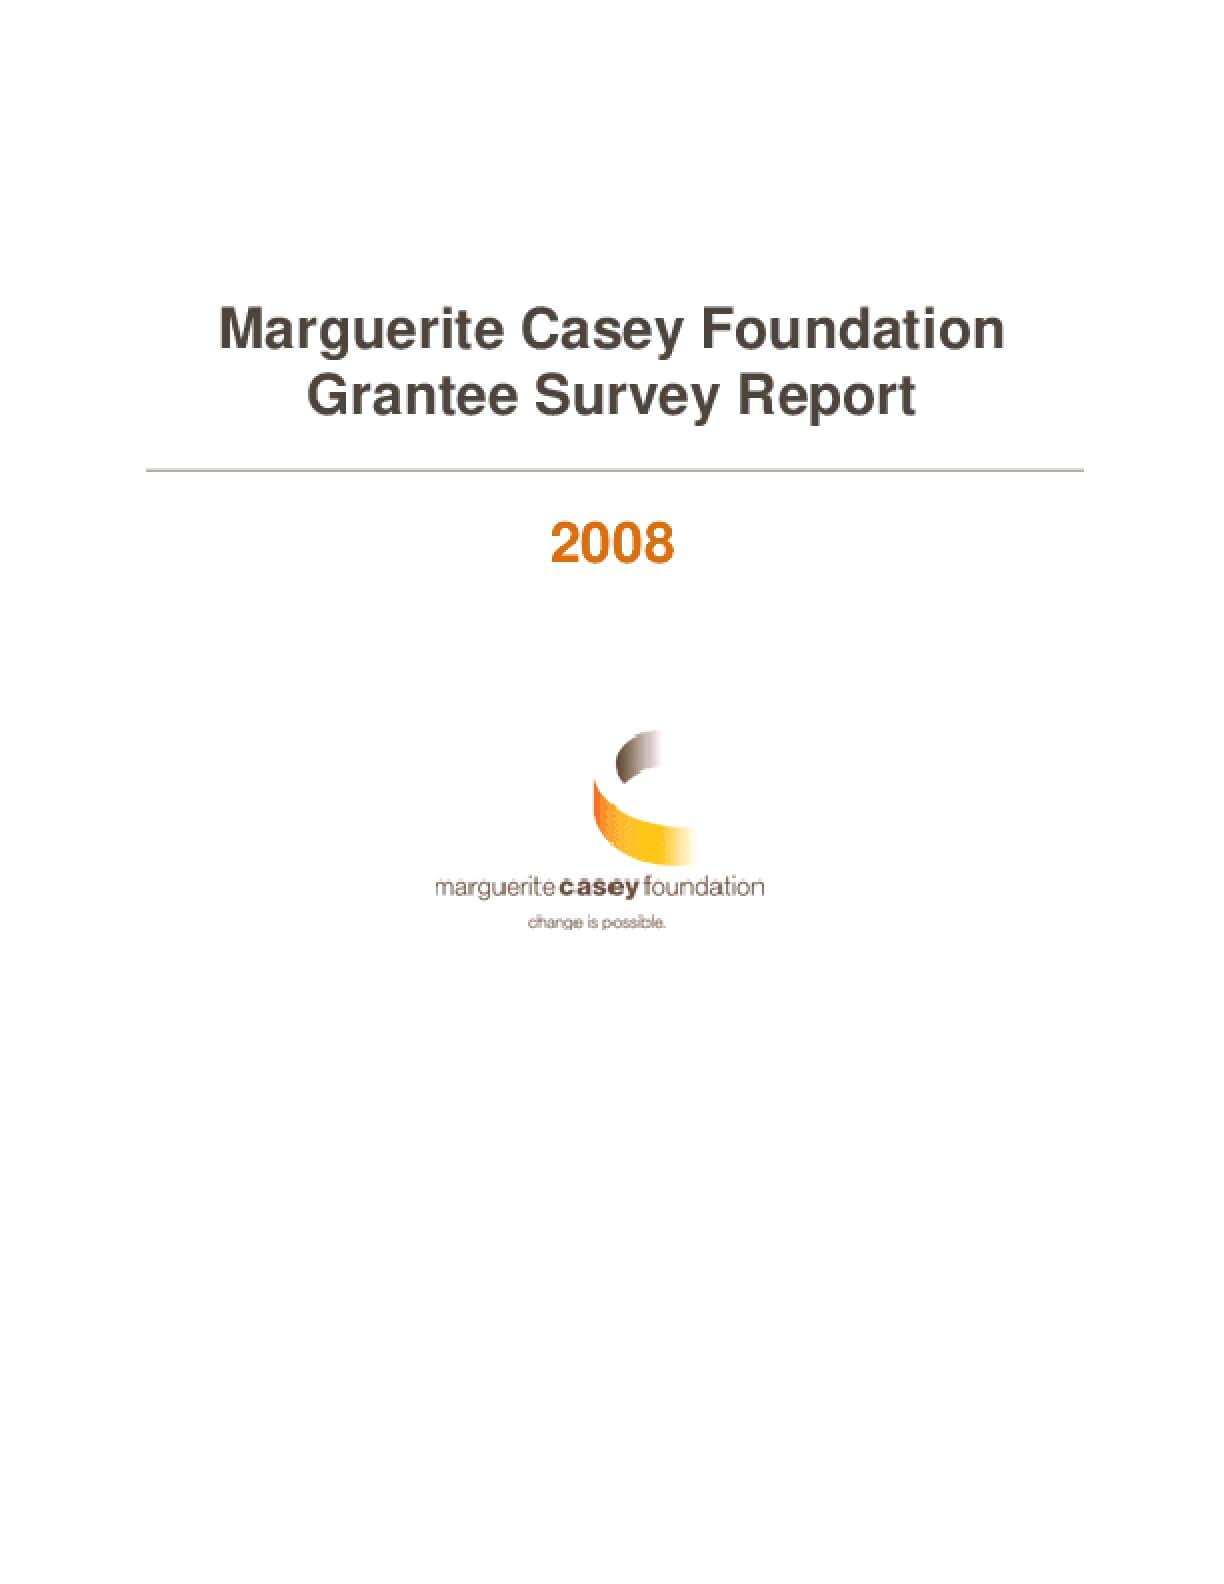 2008 Marguerite Casey Foundation Grantee Survey Report